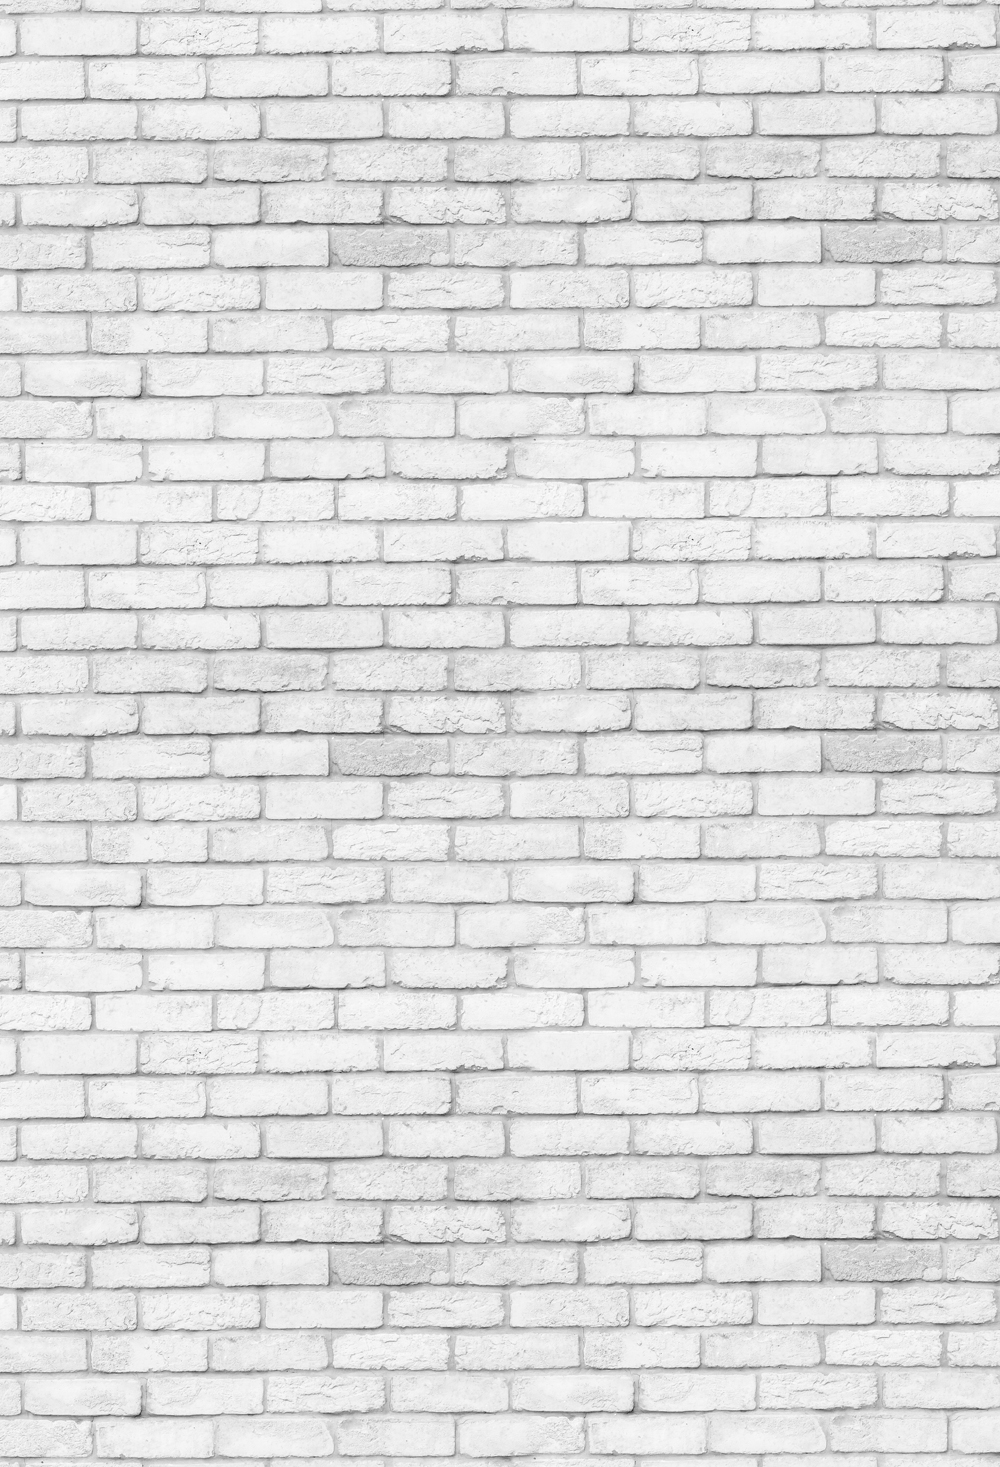 HUAYI White Stone Wall Backdrop Newborns Photo Background Vinyl Brick Wall Photography Background Props brick paper XT-6695 huayi 4pc 2x2ft wood floor brick wall backdrop vinyl photography backdrops photo props background small object shooting gy 019